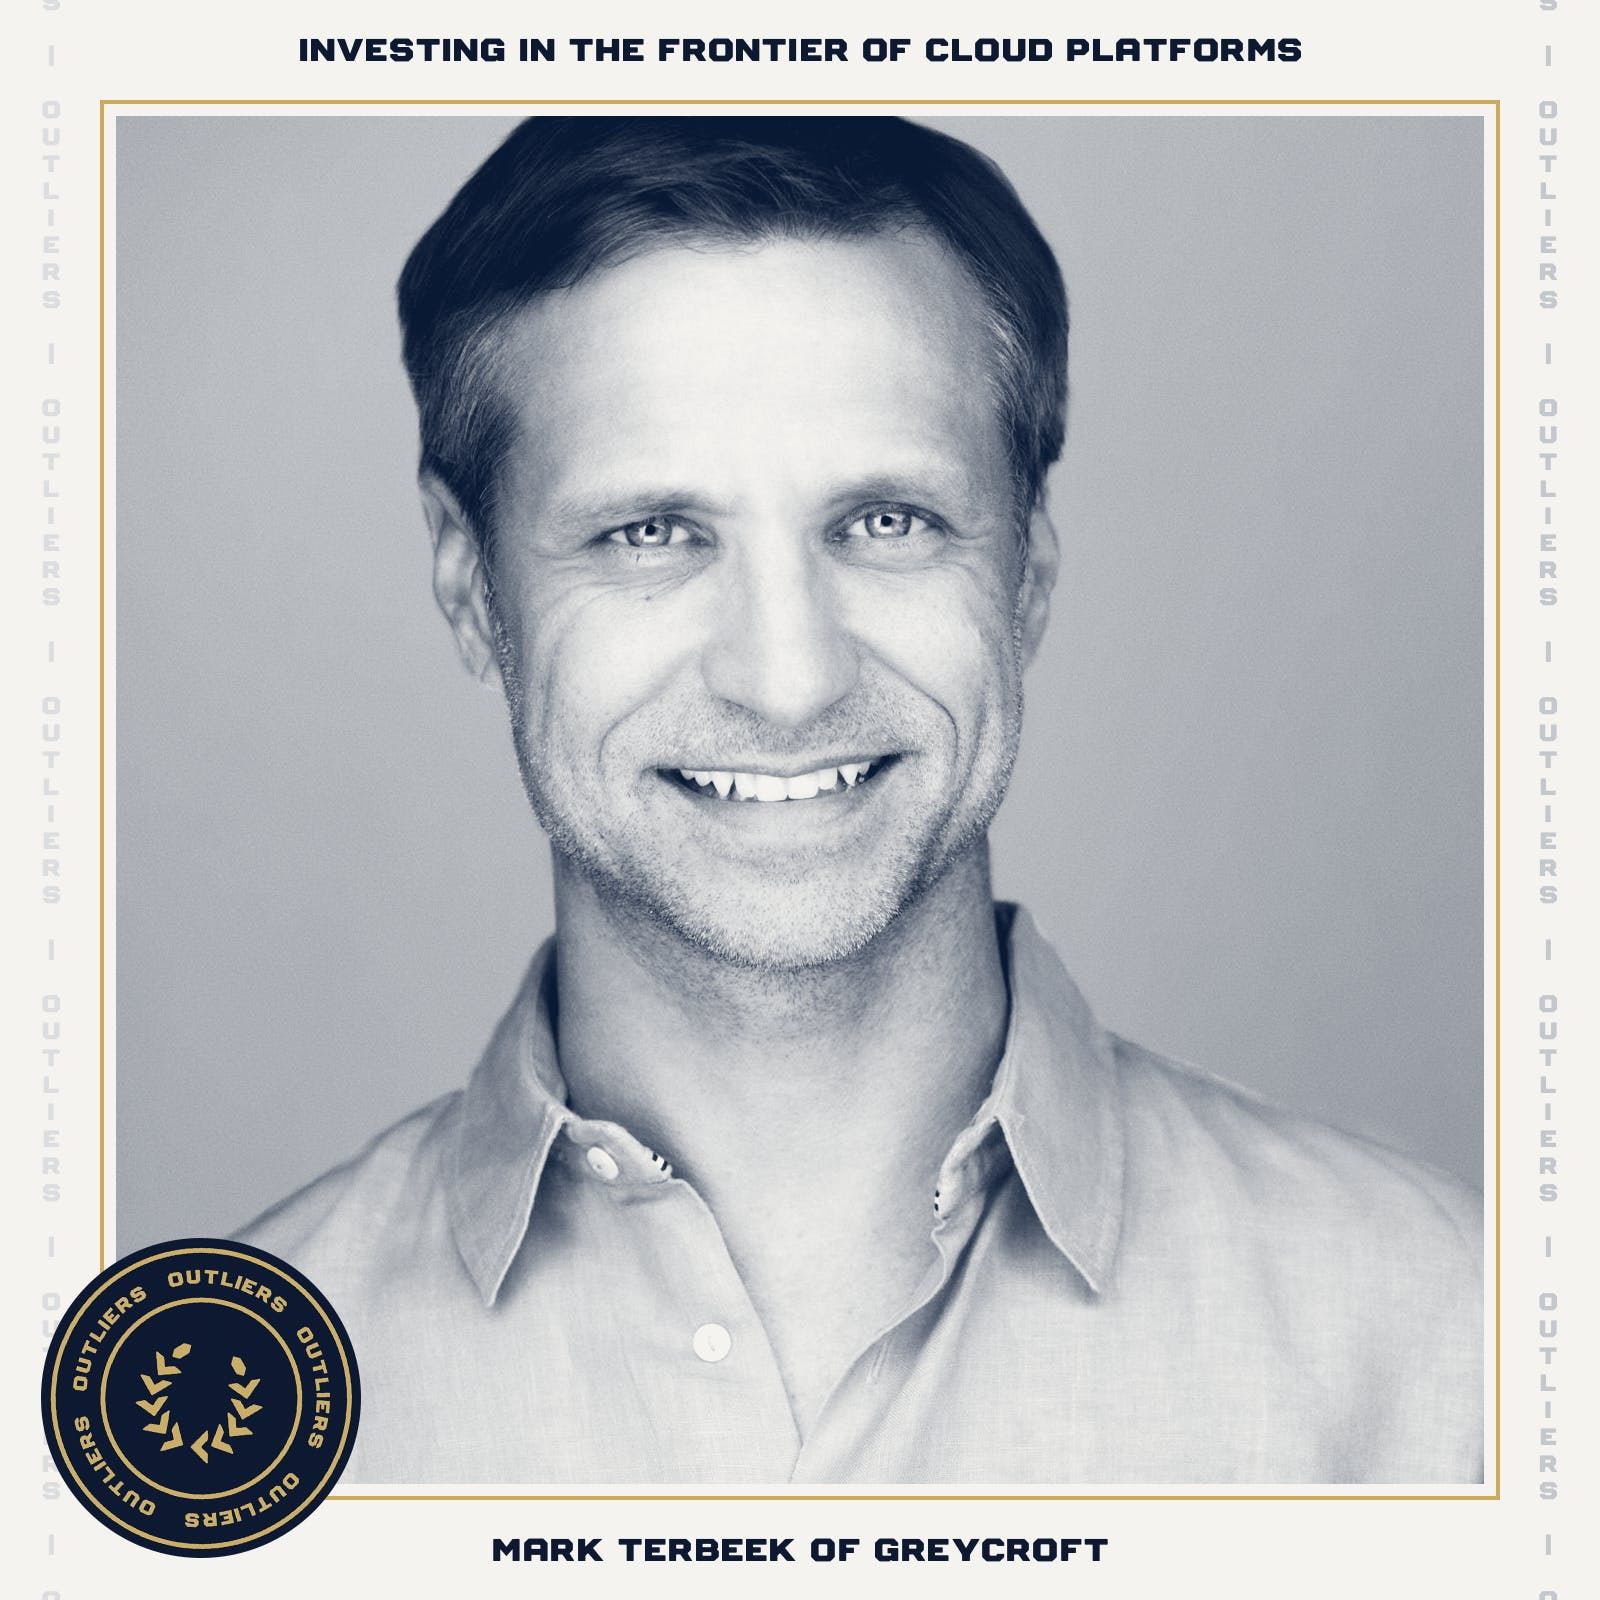 #29 Mark Terbeek of Greycroft: Investing in the Frontier of Cloud Platforms